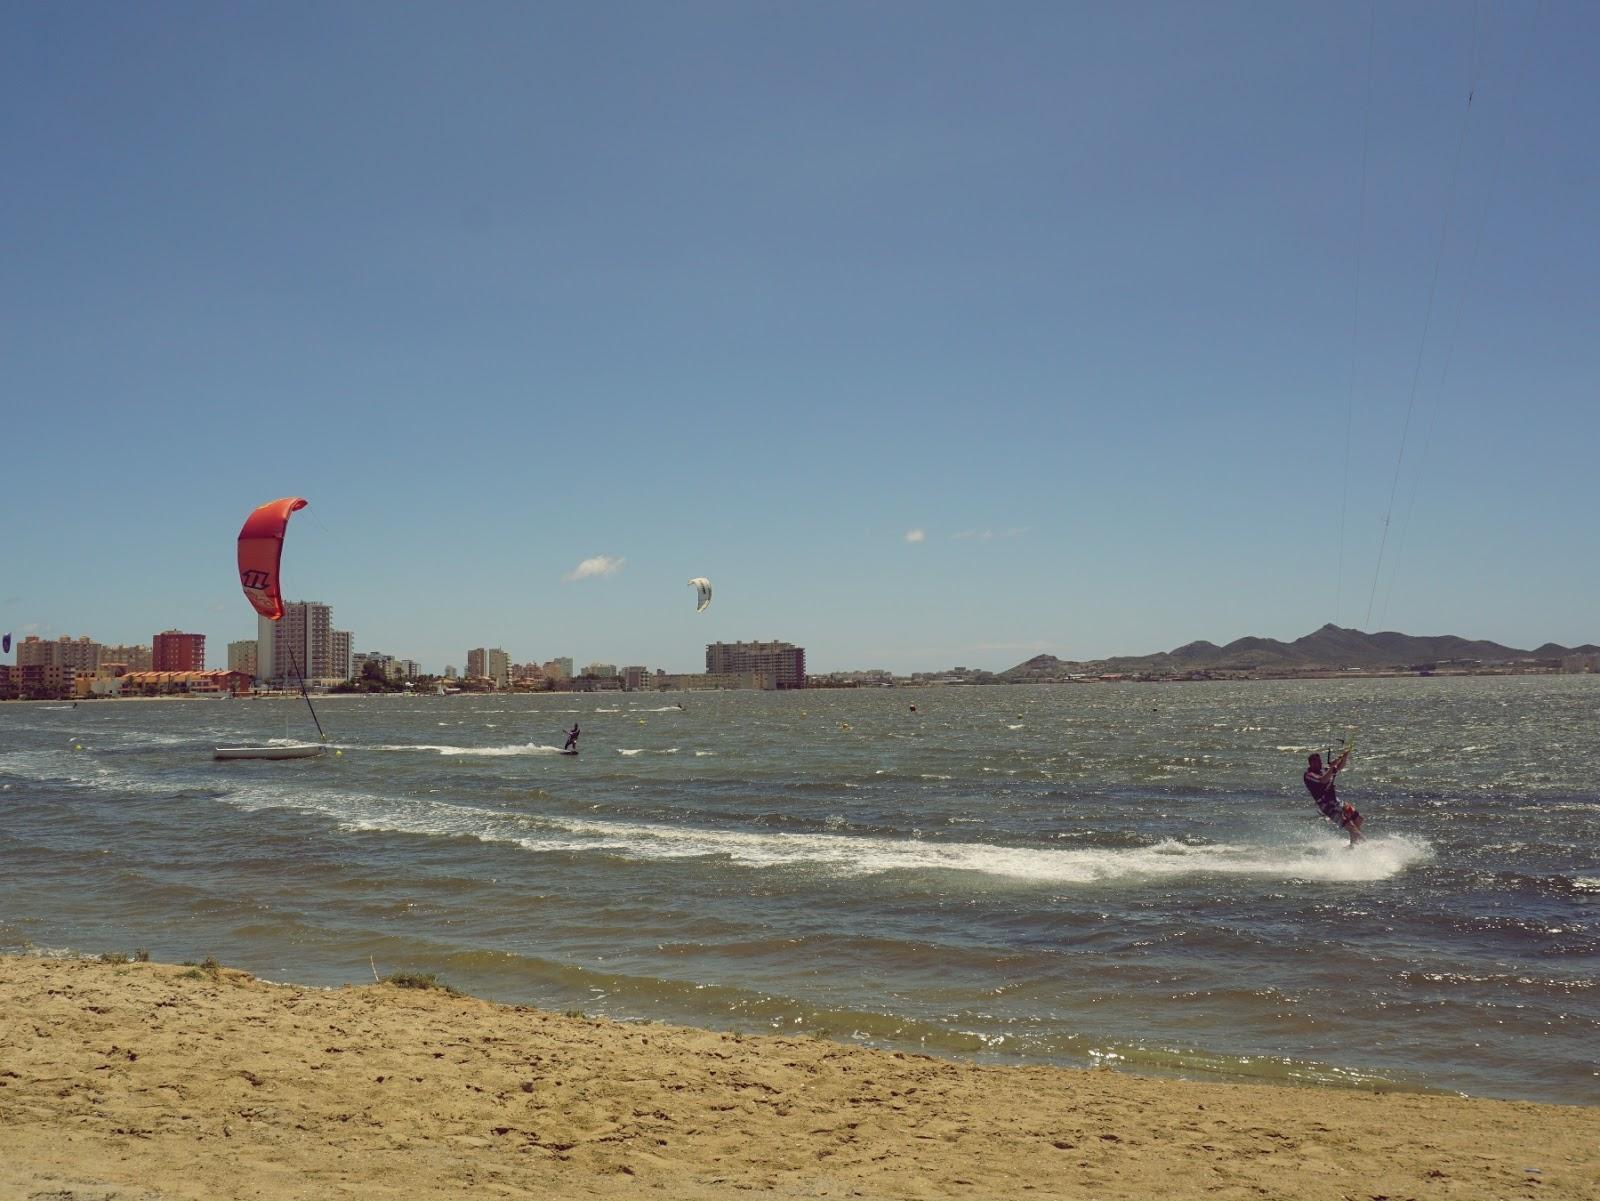 kitesurfing, Pani Dorcia, panidorcia blog, blog o Islandii, blog o Hiszpanii, wakacje w Hiszpanii, urlop w Hiszpanii, La Manga, morze, plaża, La Mar Menor